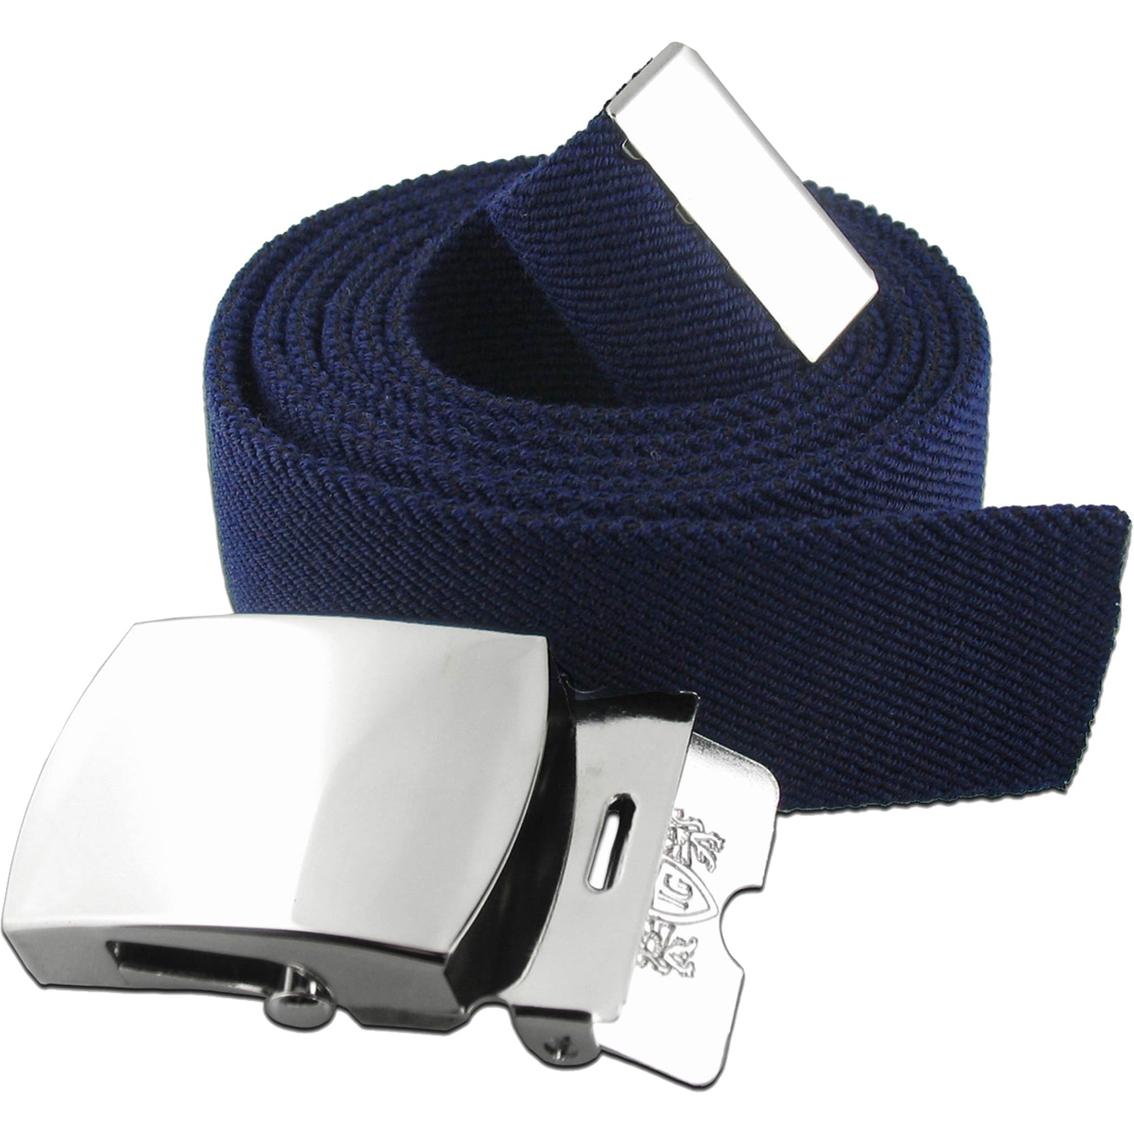 Air Force Blue Elastic Belt | Accessories | Military | Shop